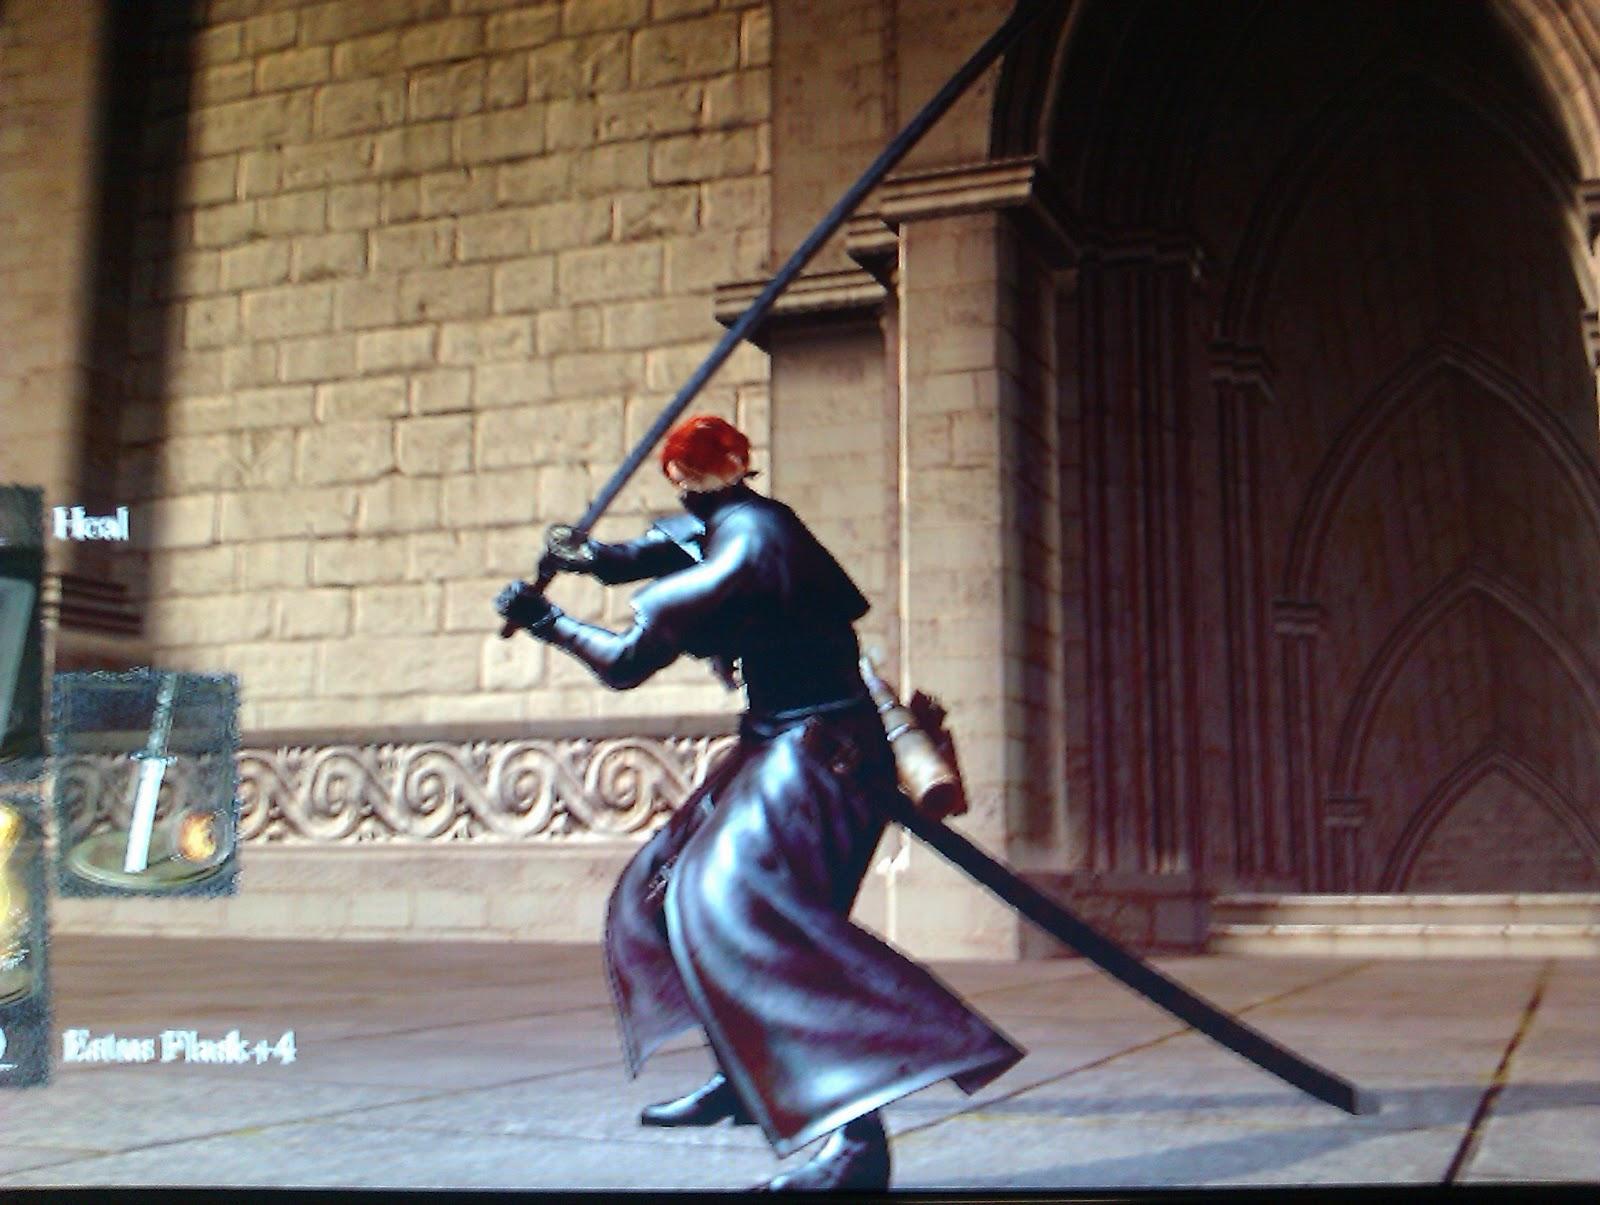 Chronicles Of A Lao Gamer: Interesting Dark Souls Build - photo#8